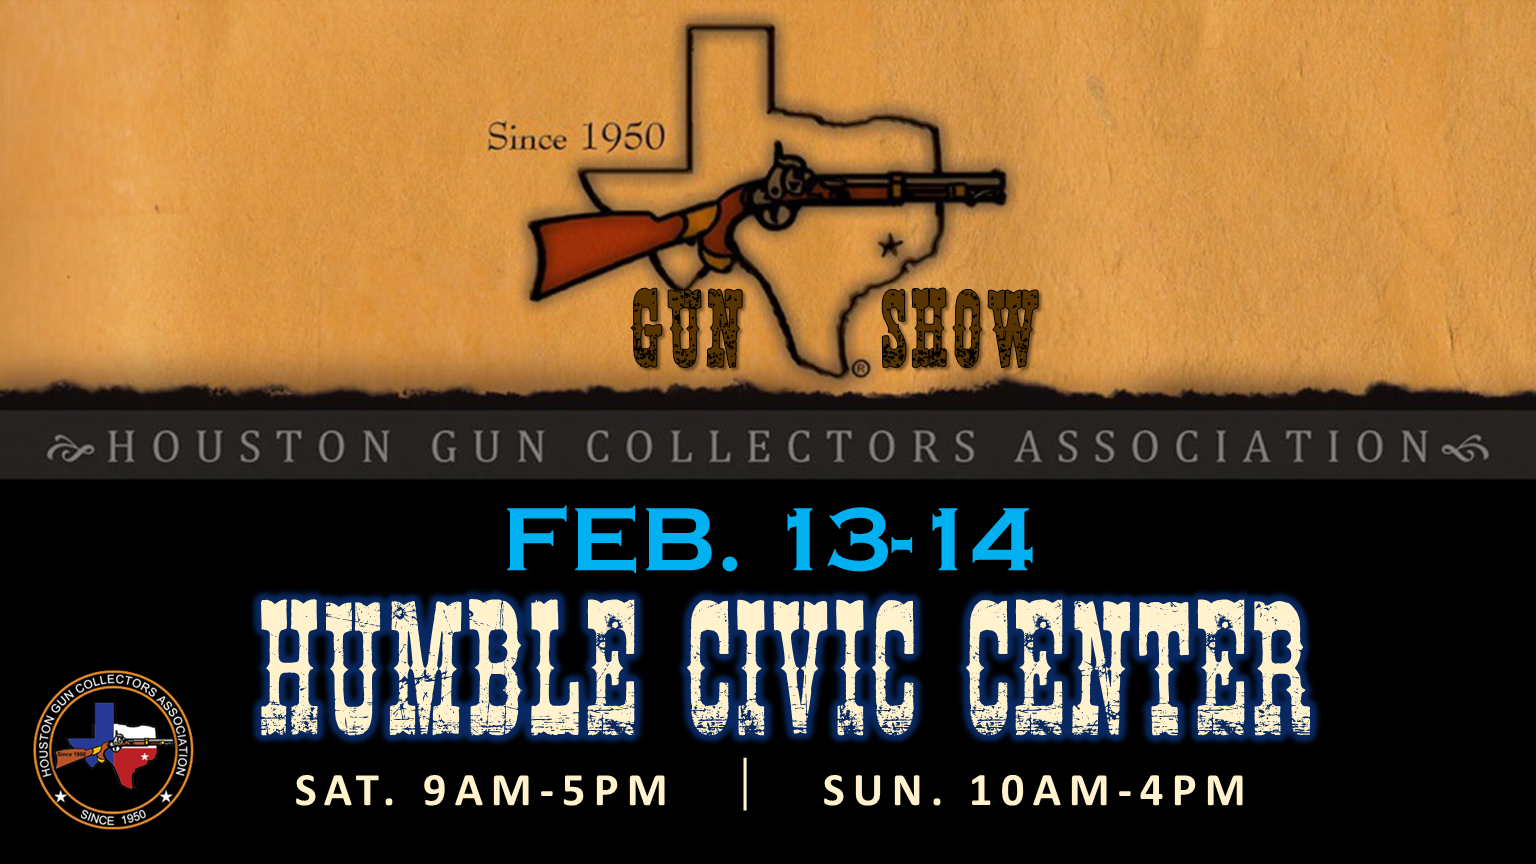 HGCA GUN SHOW